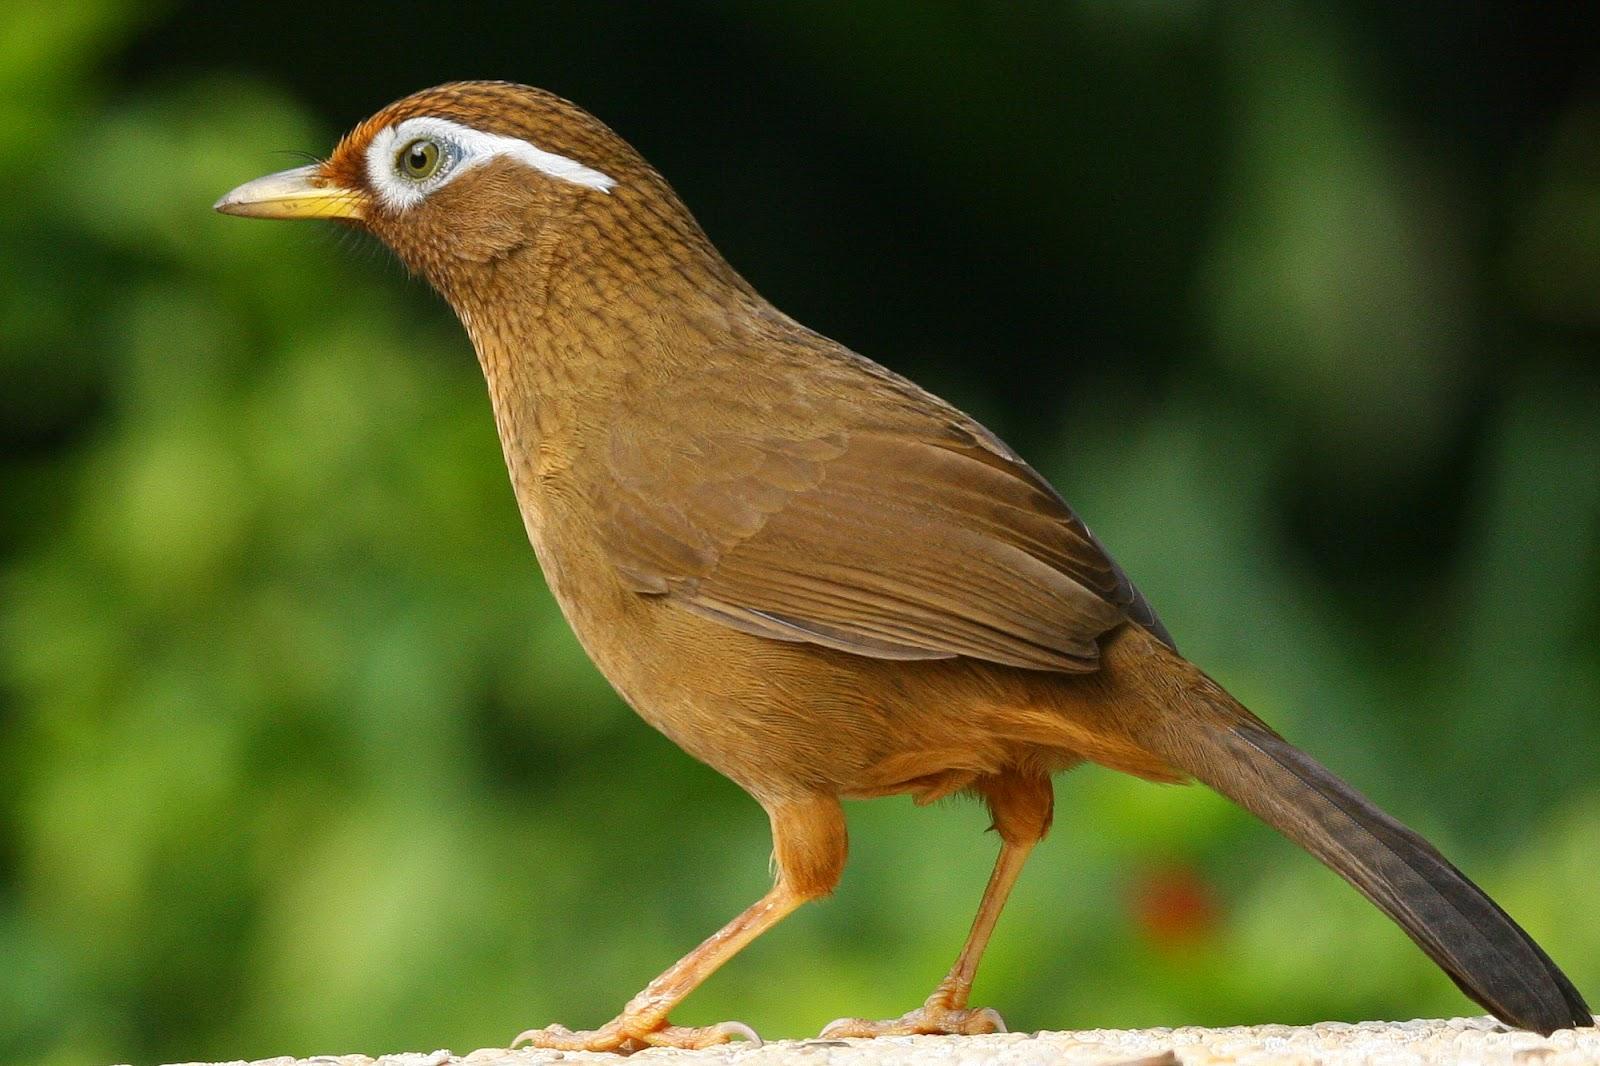 Gambar Burung Berkicau - Download Image